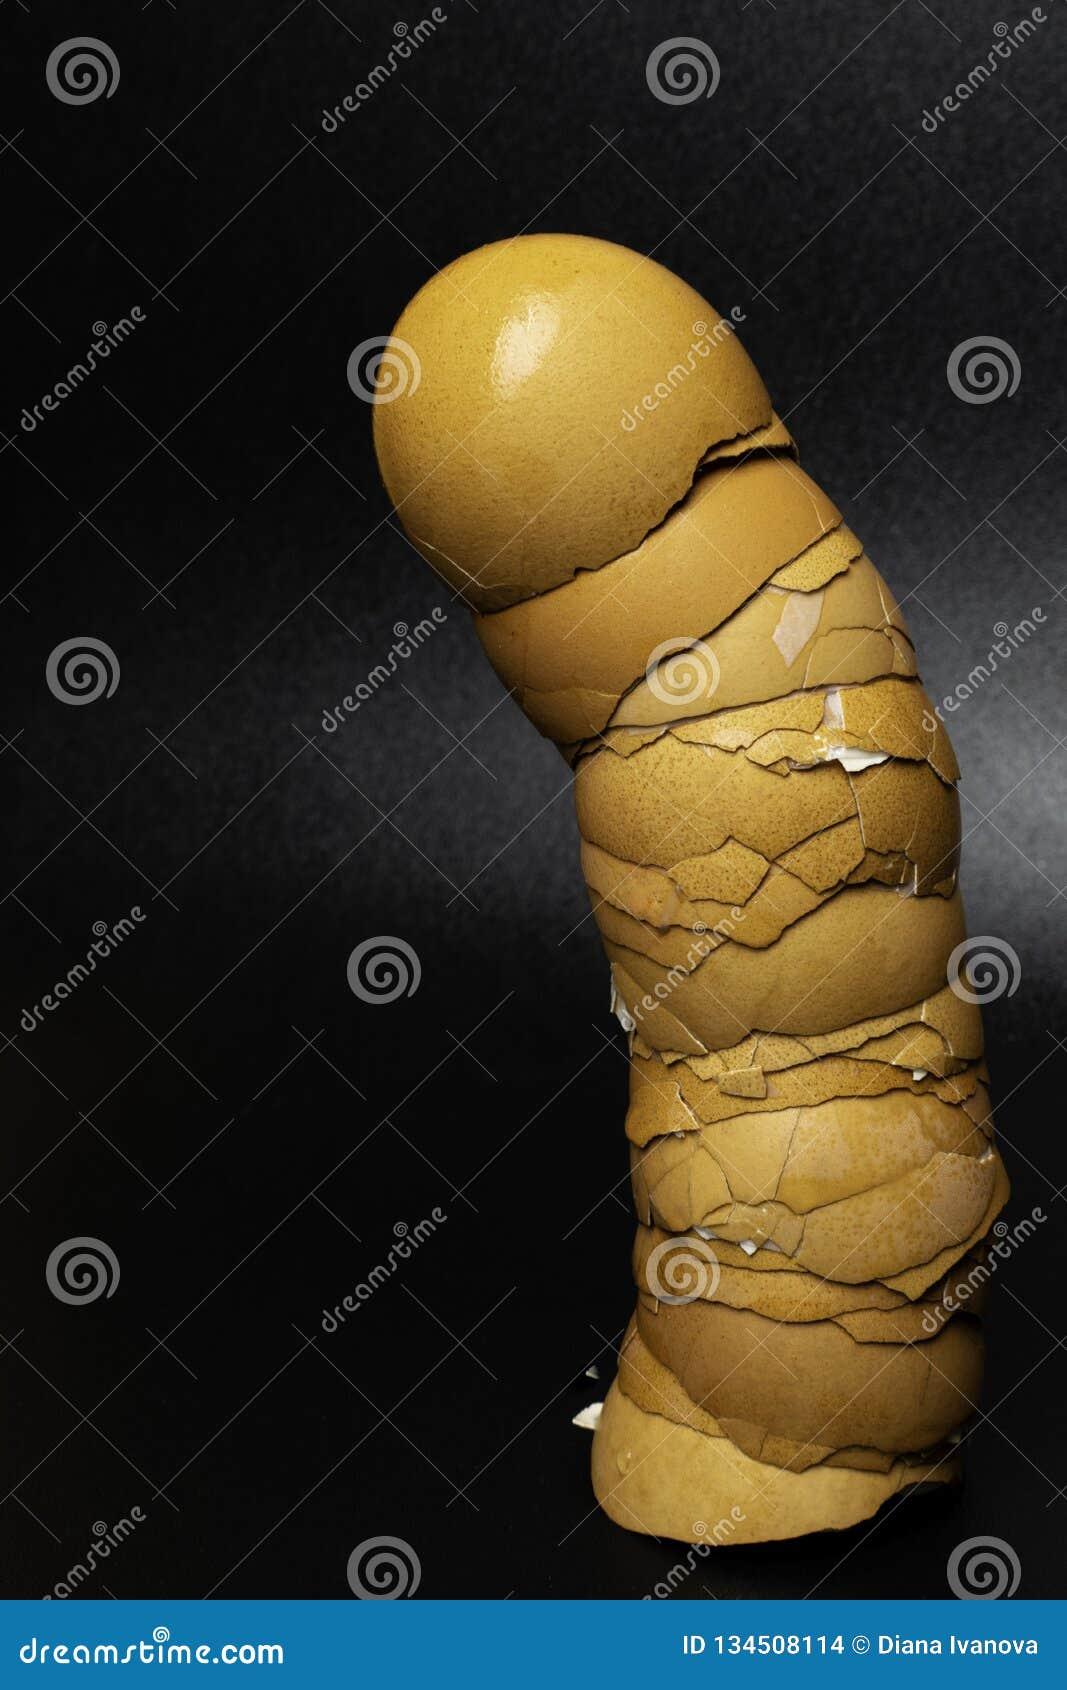 mały penisa i jajka jak budować penisa